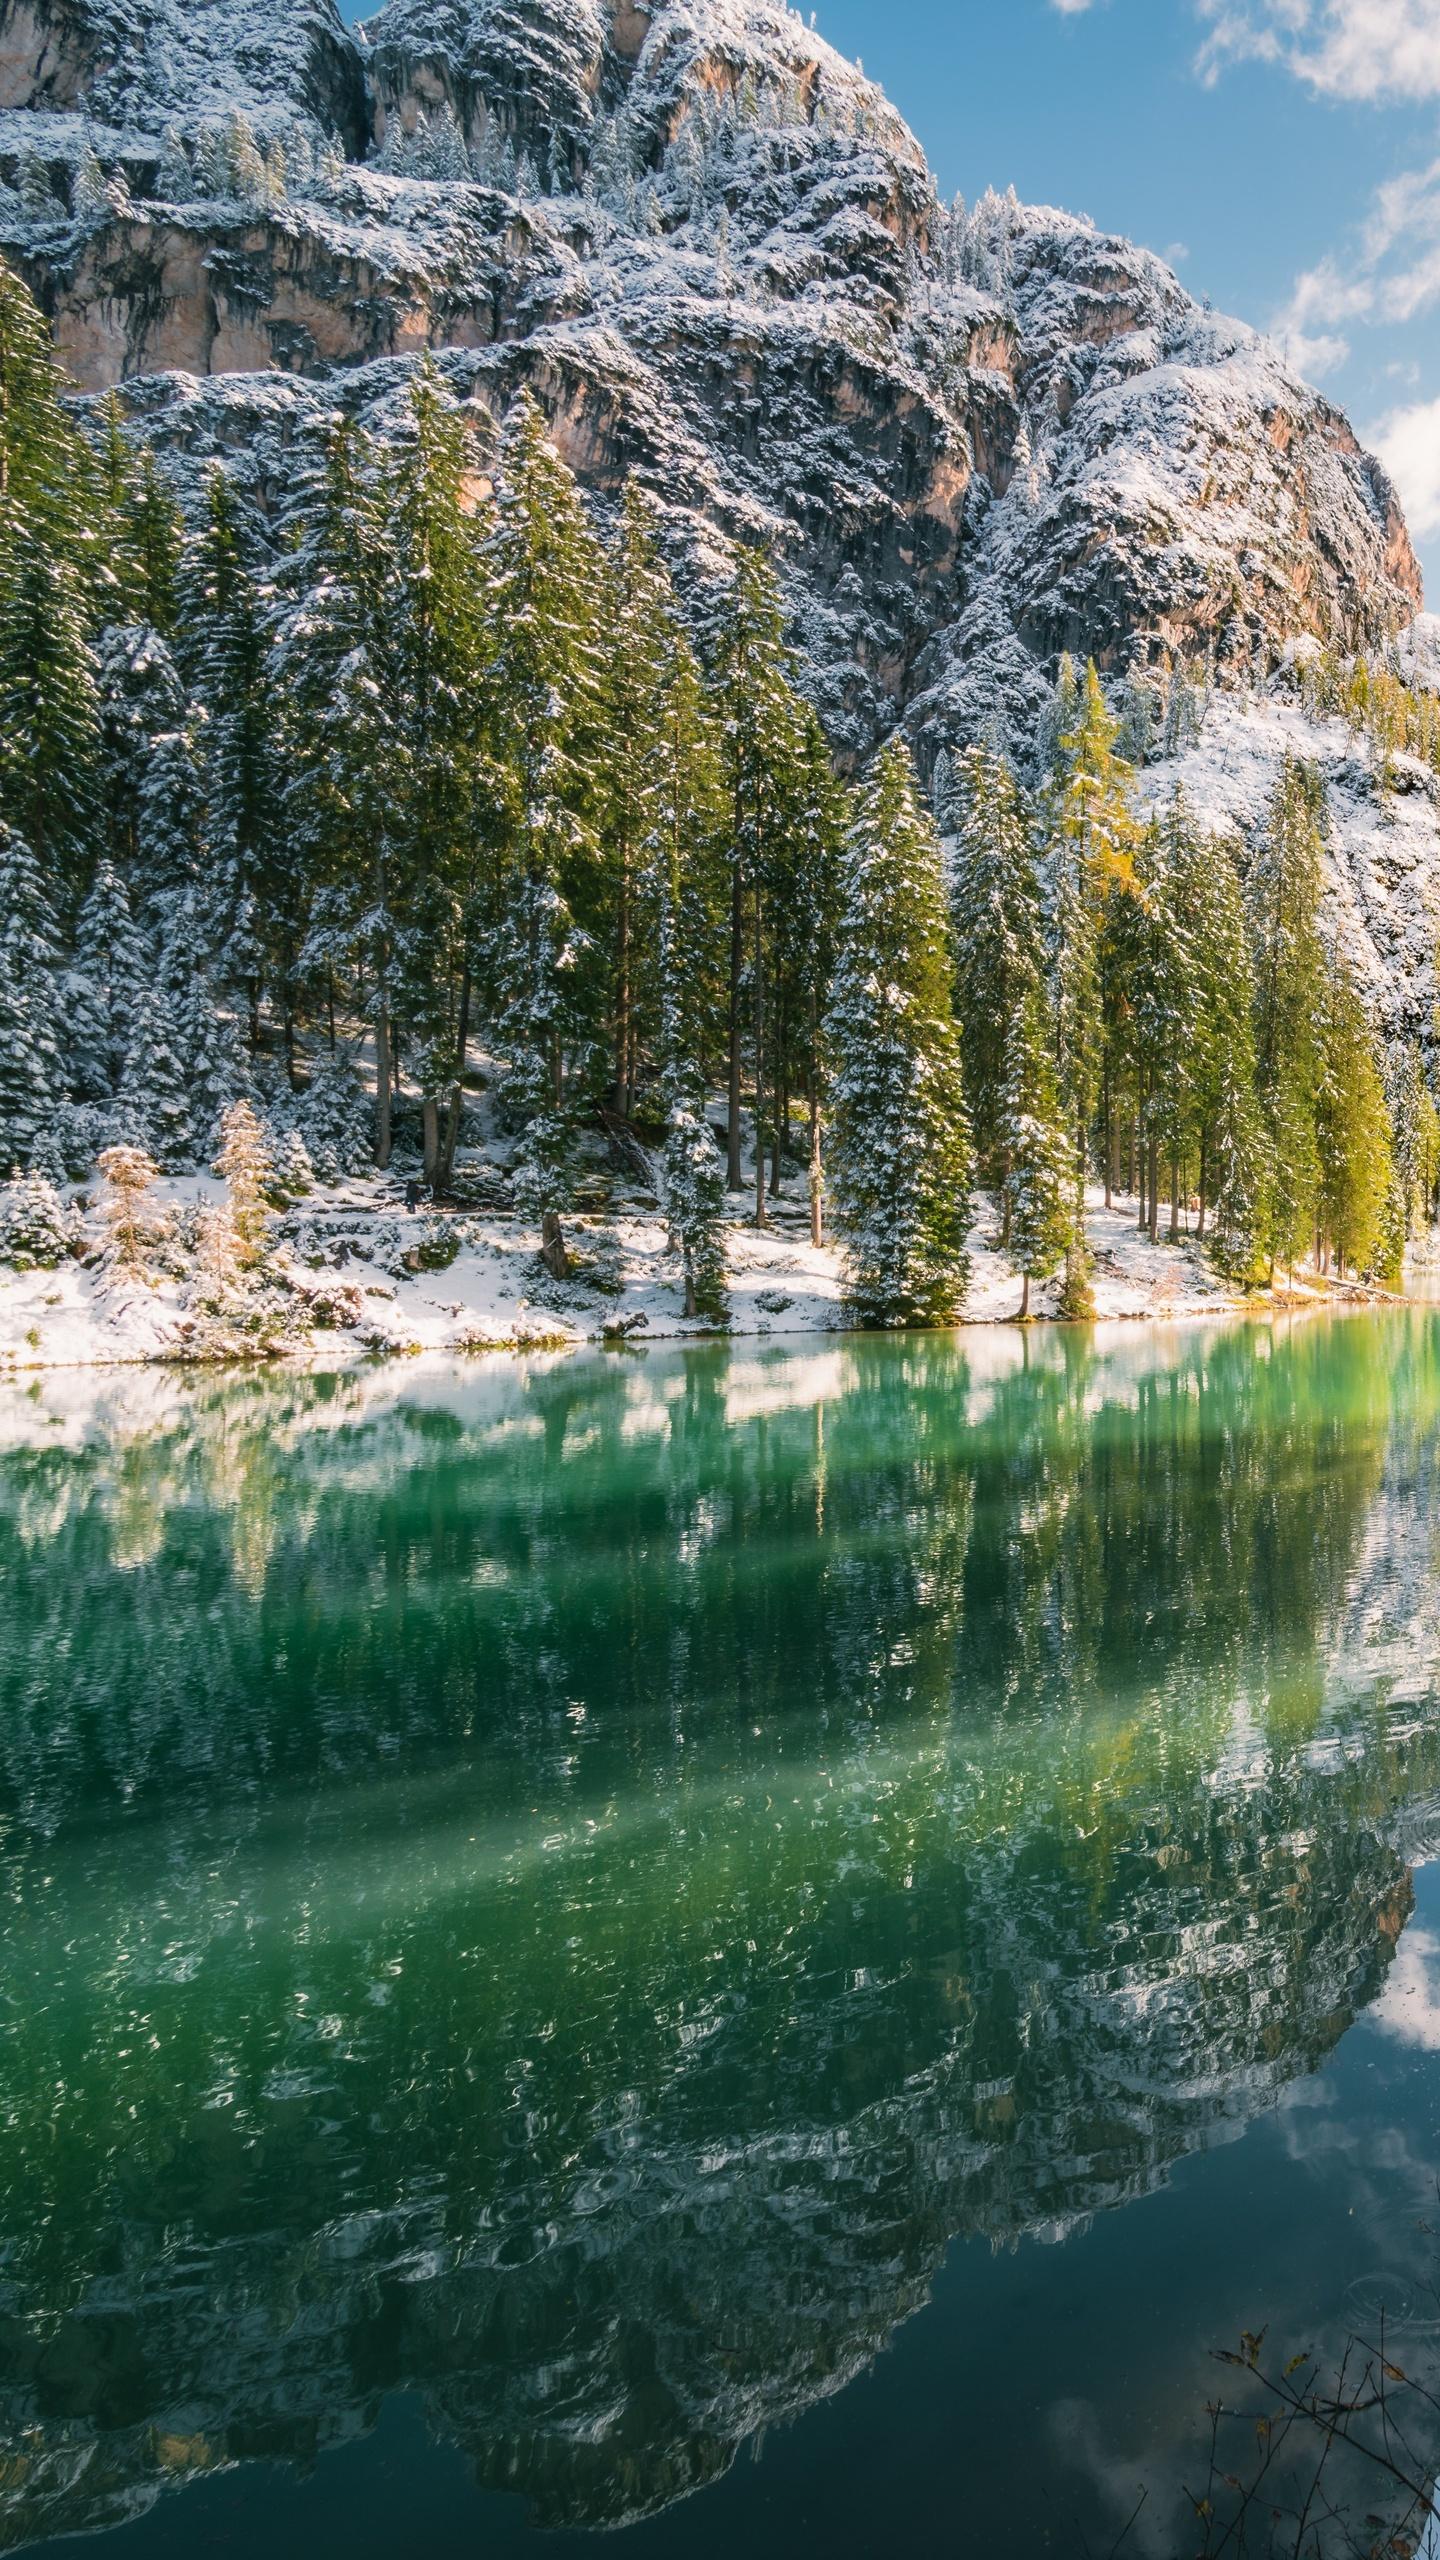 green-trees-near-body-of-water-reflection-8k-iv.jpg